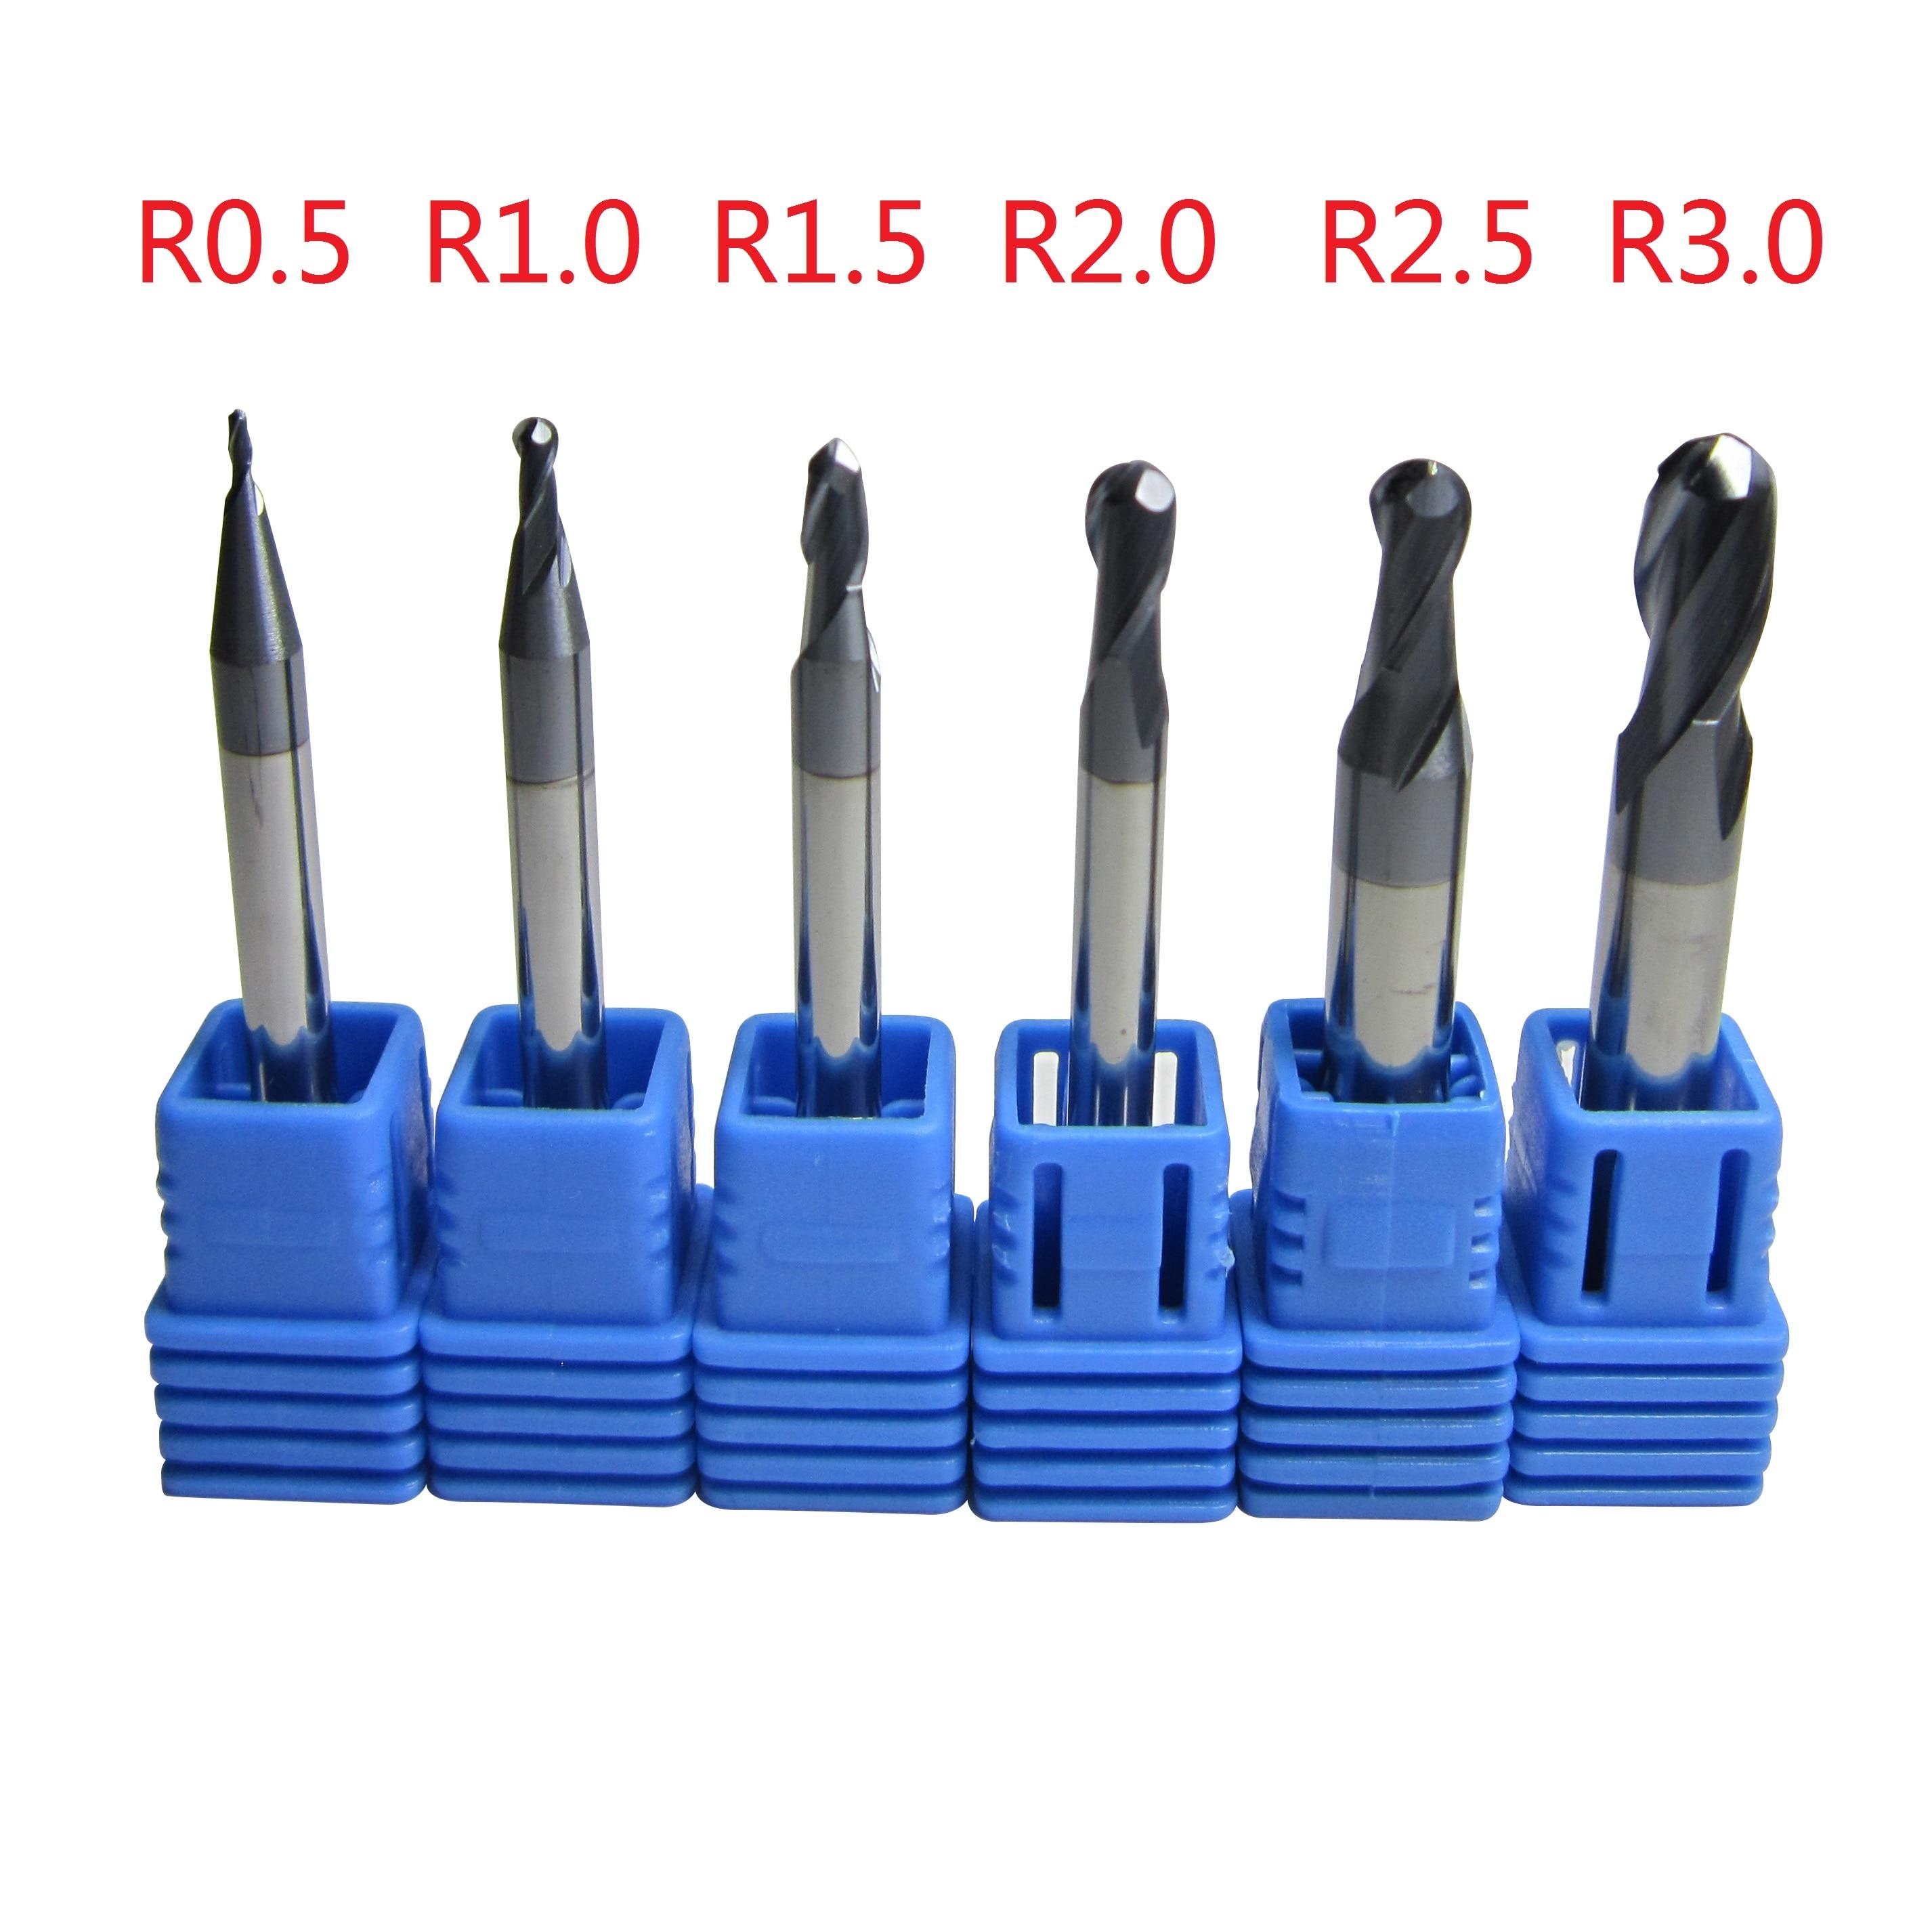 6PCS Tungsten Carbide Ball Nose End Mill set CNC machine milling cutter Ø 1mm - 6mm metalworking HRC45 HRC55 HRC58 HRC62 HRC68